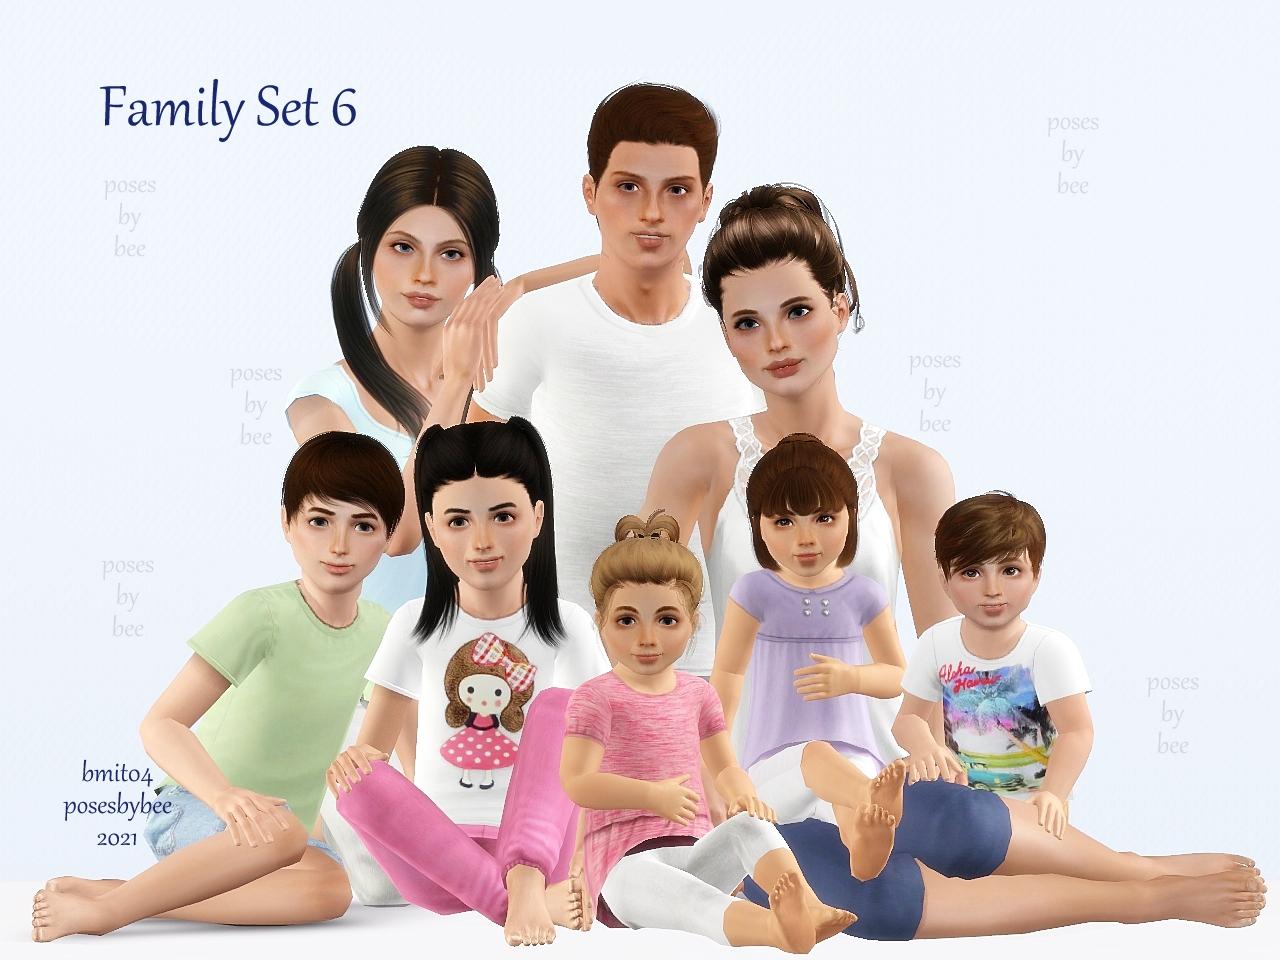 family-set-6-pic-3